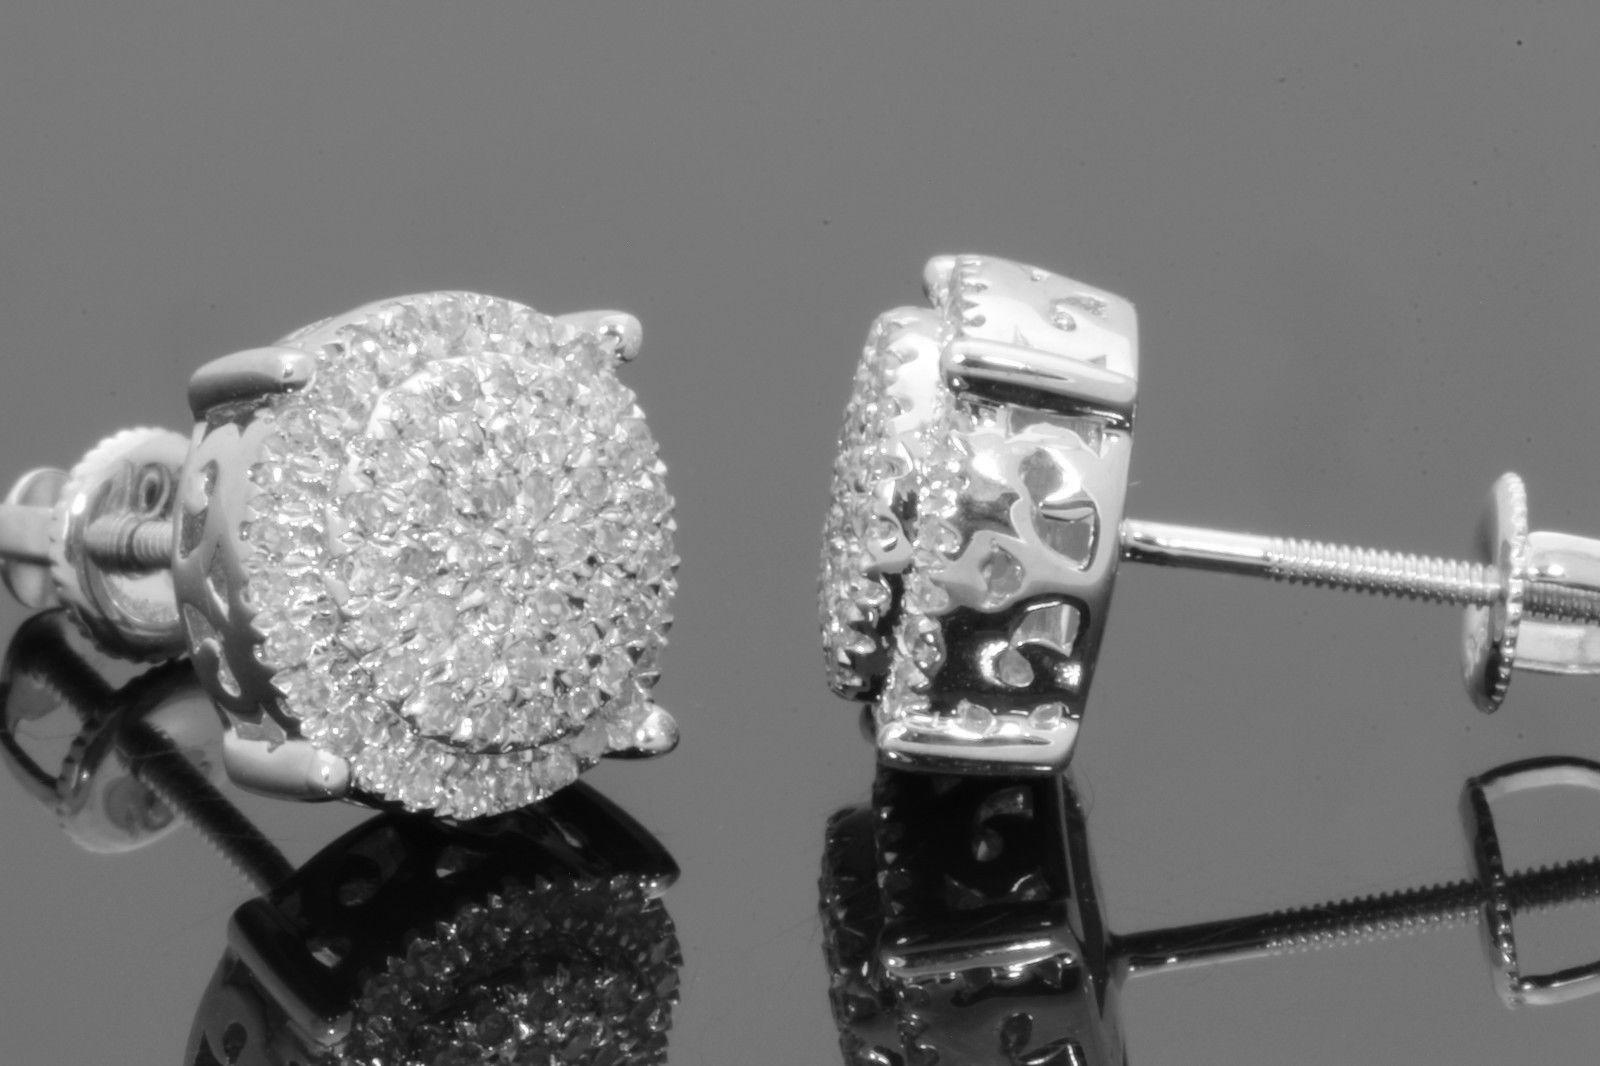 Details about 10K WHITE GOLD .50 CARAT MENS WOMENS 10 mm 100% GENUINE  DIAMONDS EARRING STUDS 825efdcbde